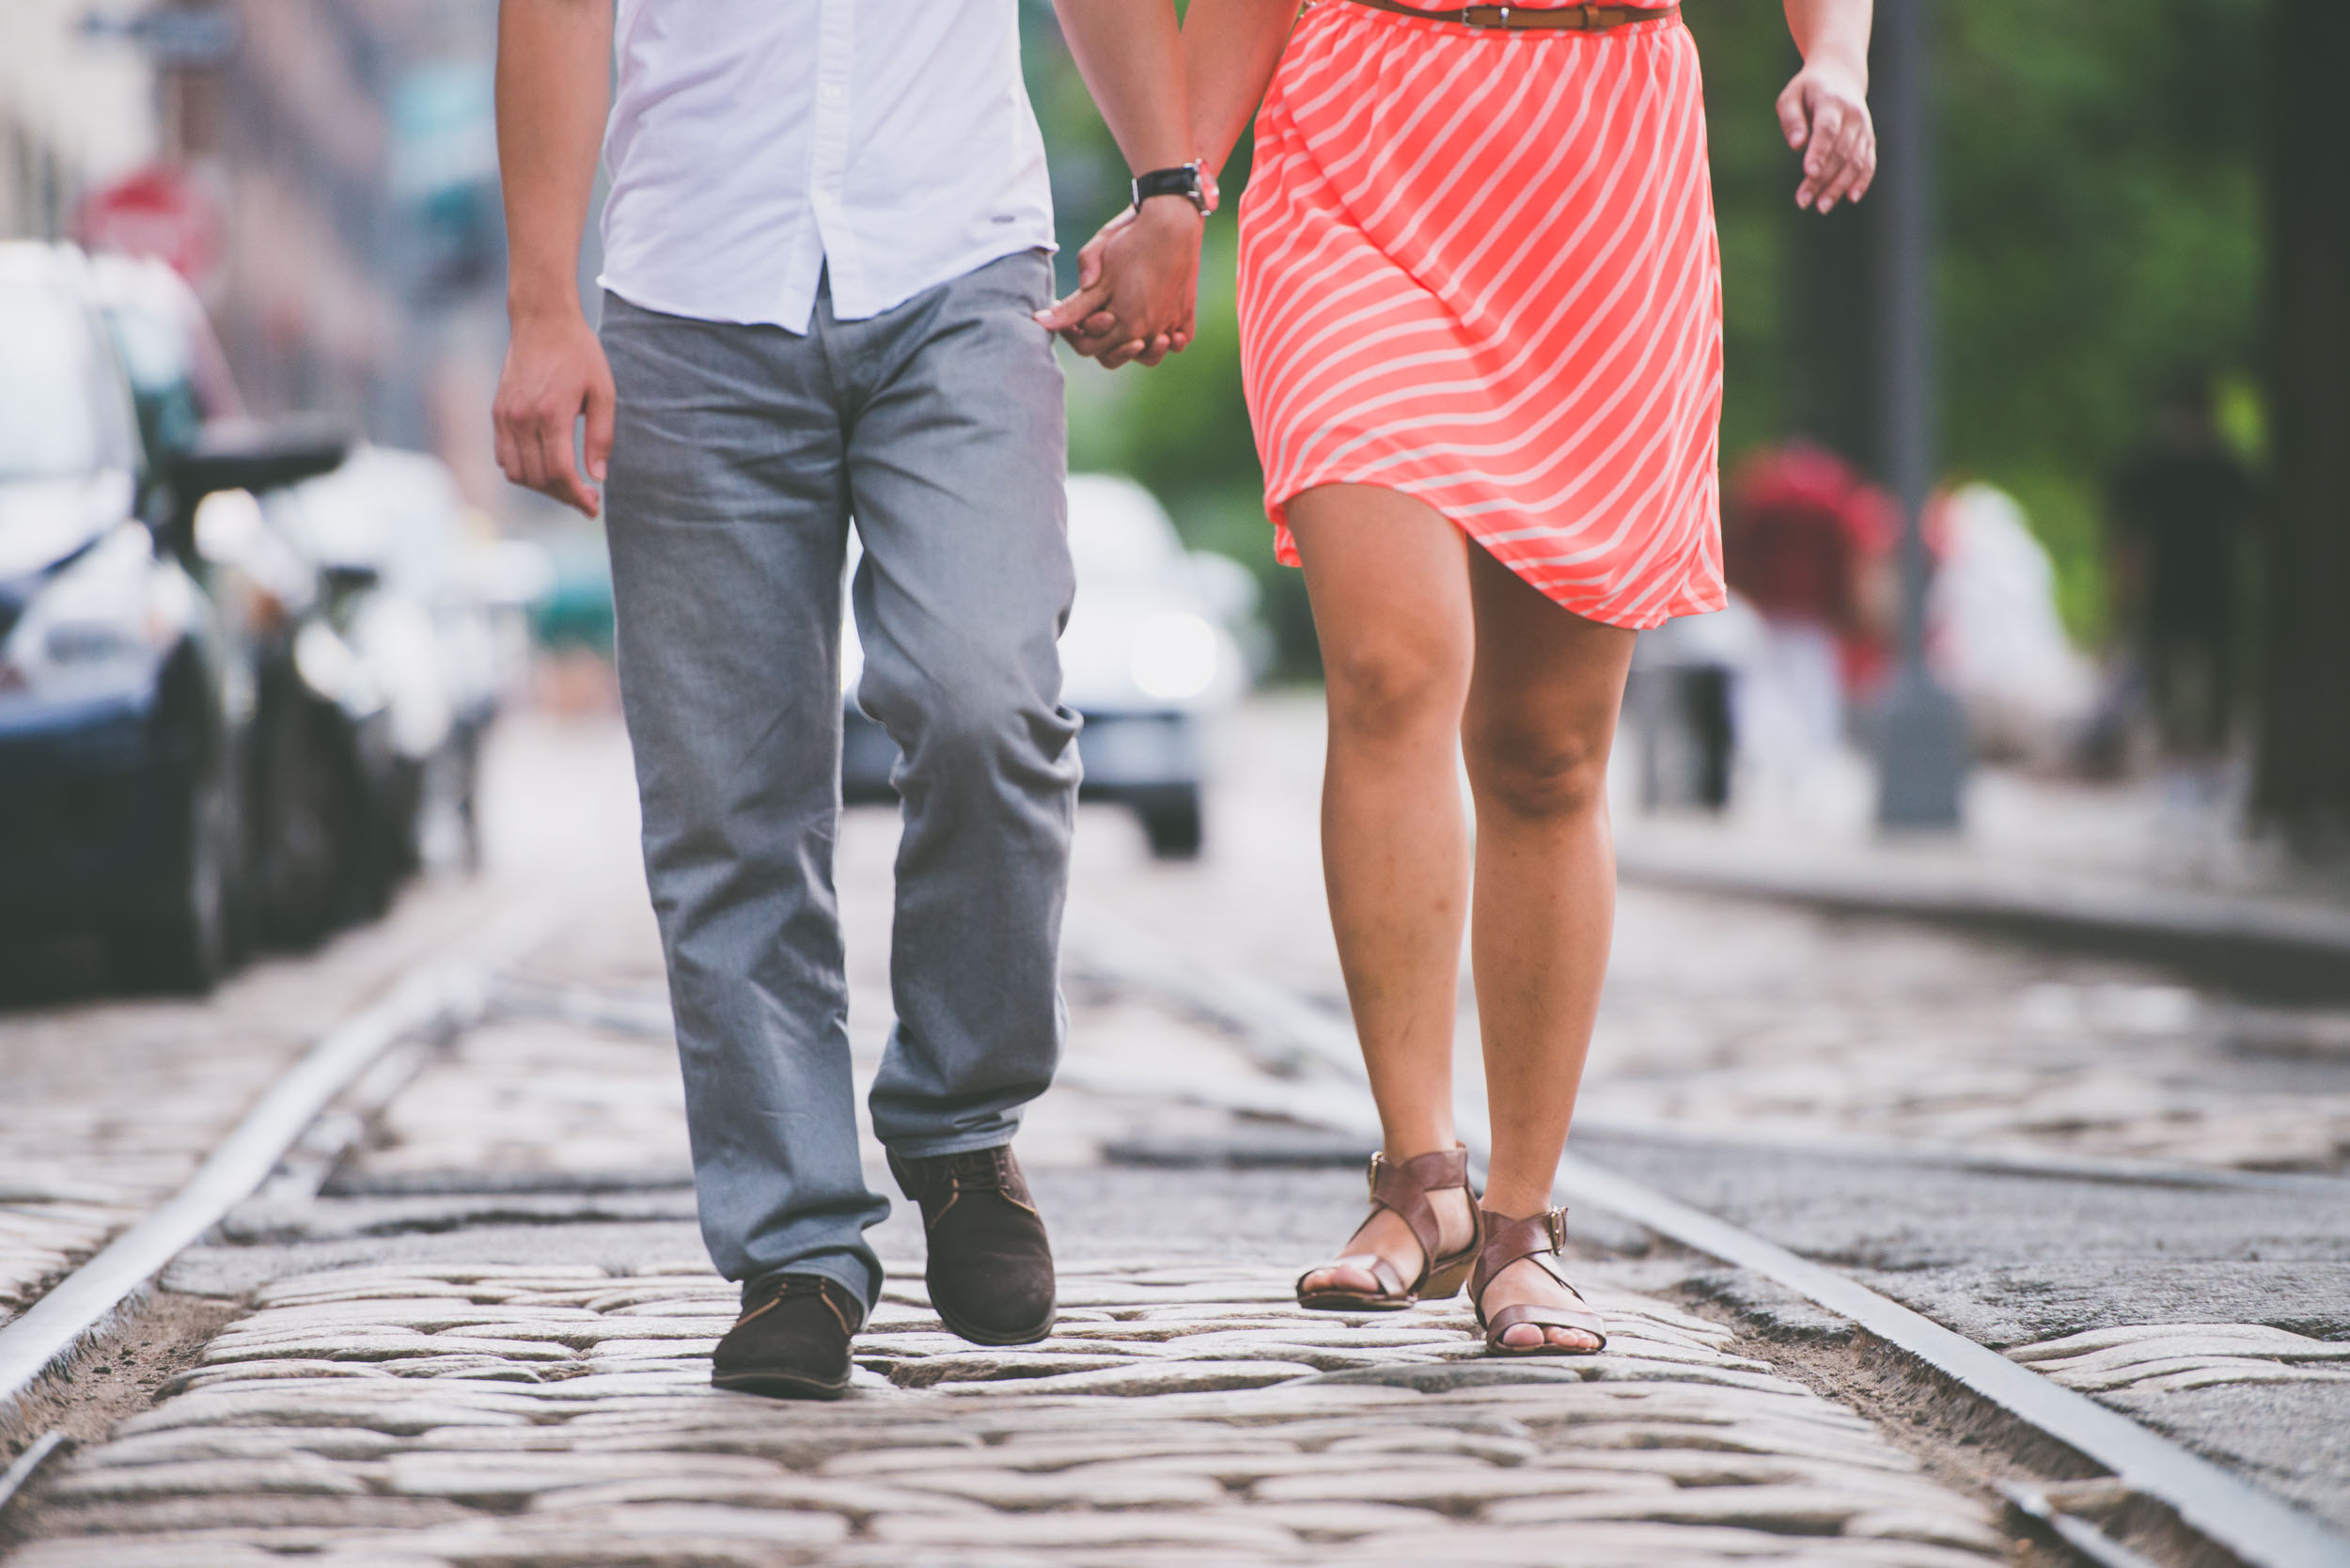 Legs walking - Engagement Portraits - Photo credit Nicola Bailey.jpg